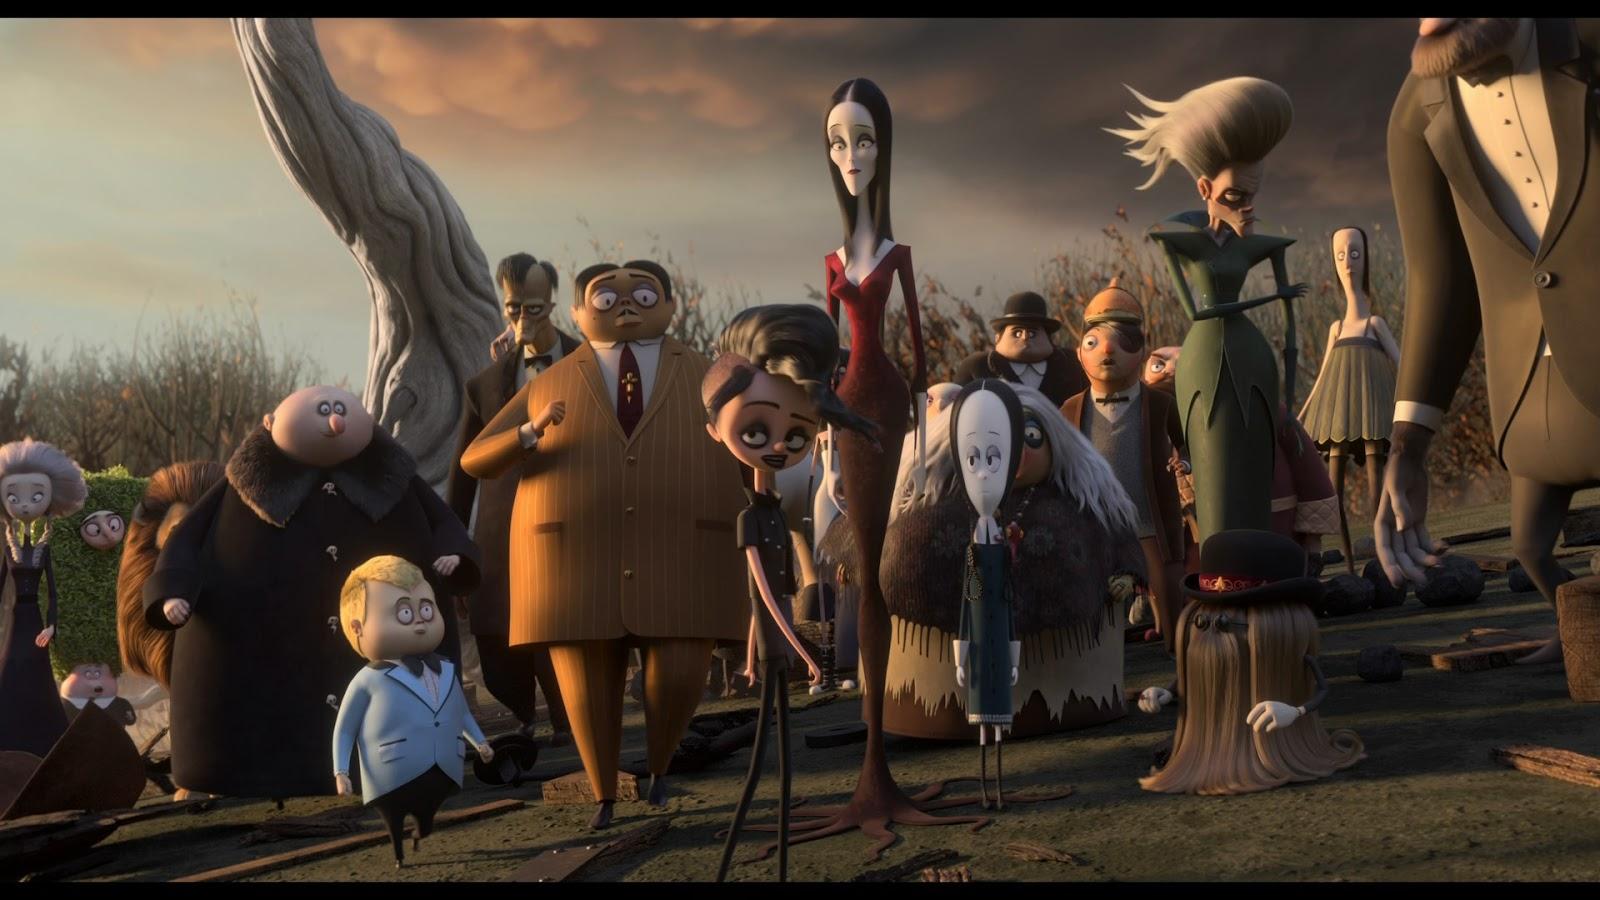 La+familia+Addams+%282019%29+1080p+BDRemux+Latino+-+Ingles+-+Descargatepelis.com.mkv_snapshot_01.15.52_%5B2020.01.11_11.09.38%5D.jpg (1600×900)